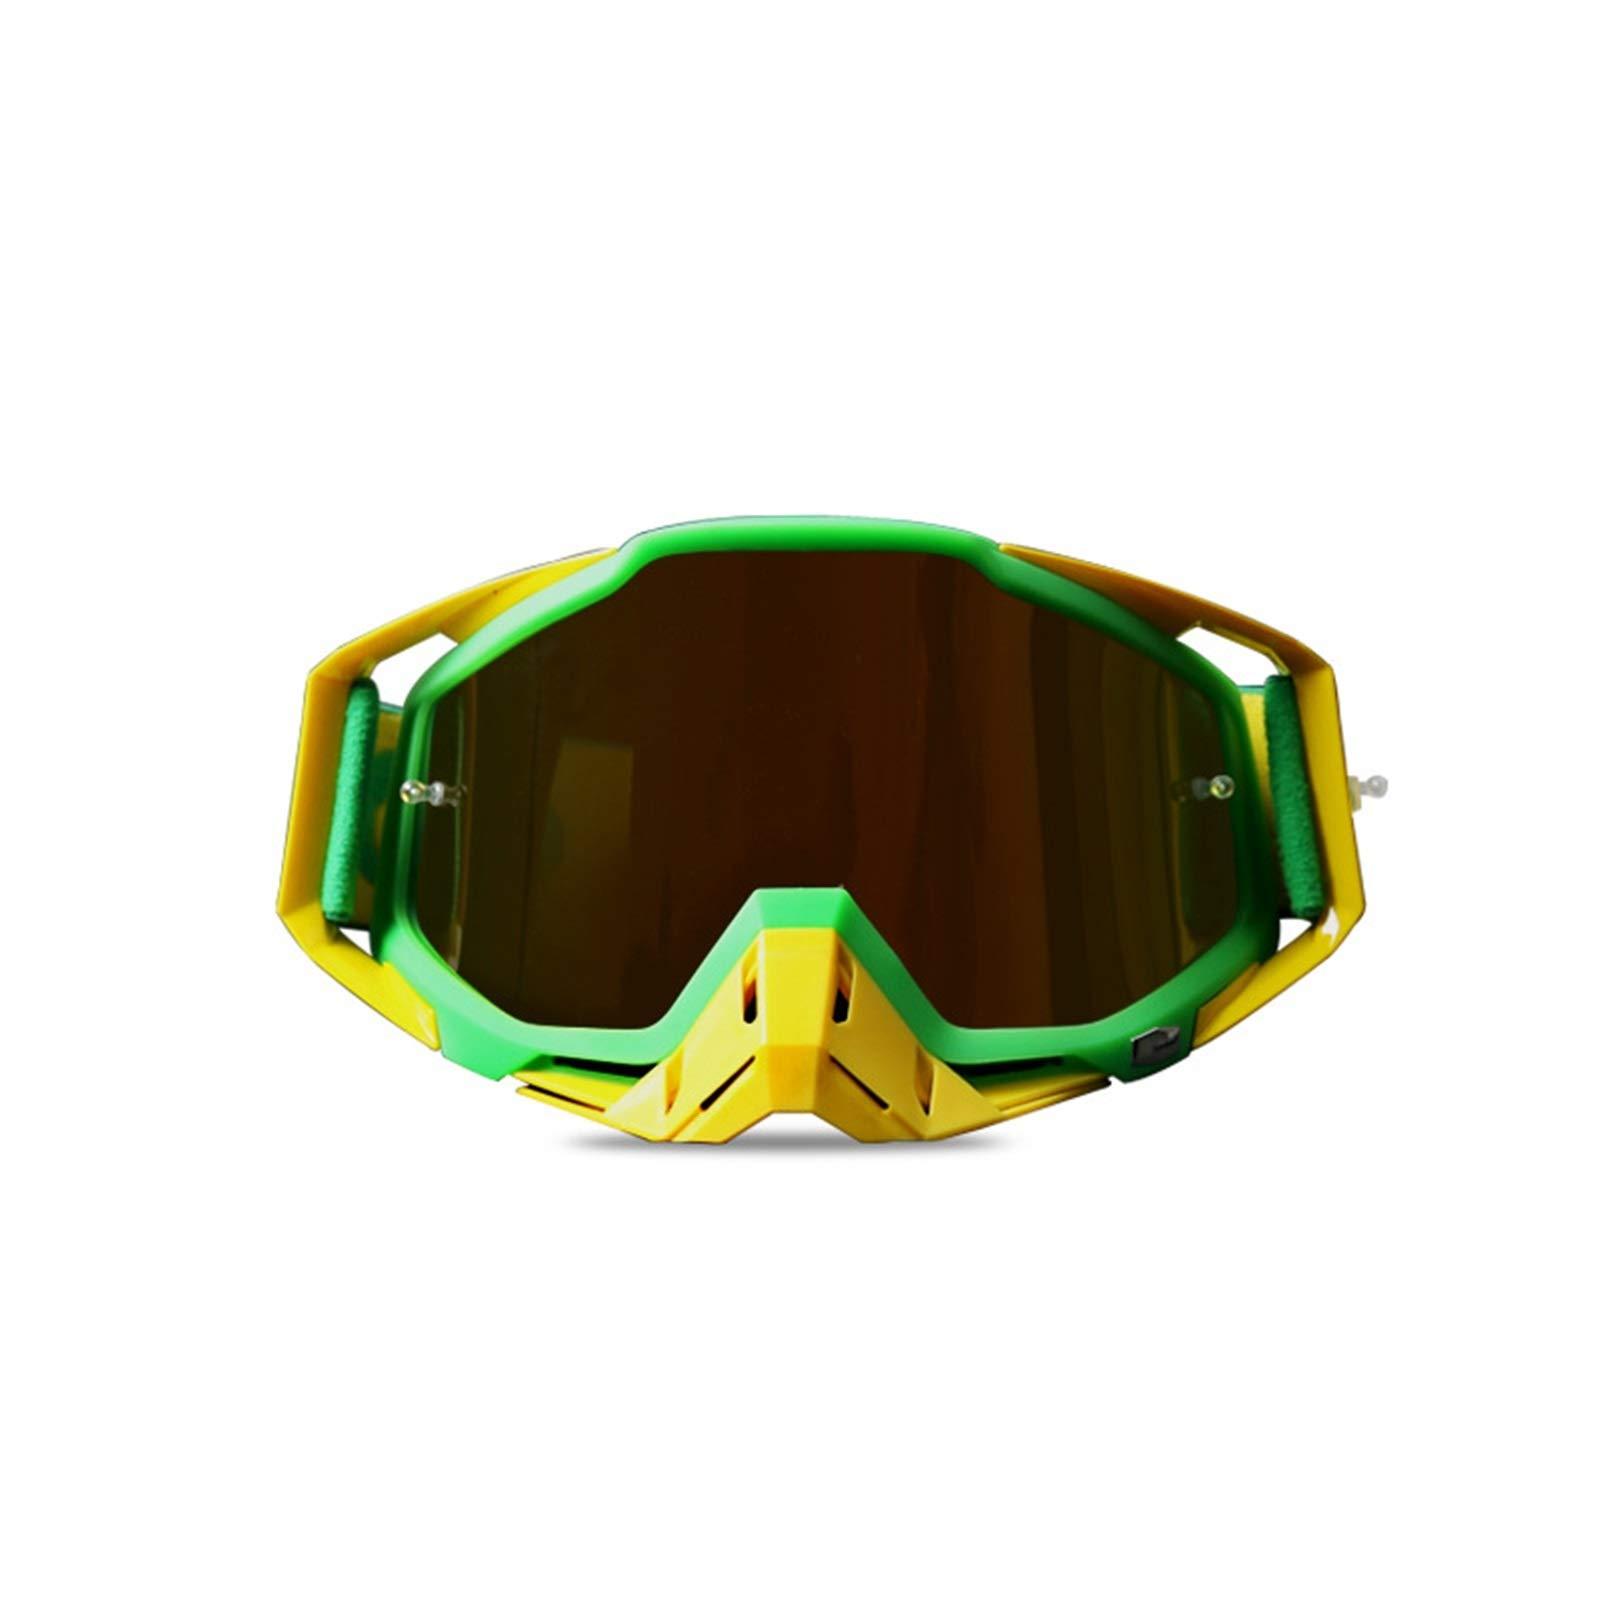 Adisaer Cycling Sunglasses Motorcycle Racing Riding Goggles ski Goggles Green Yellow for Adults